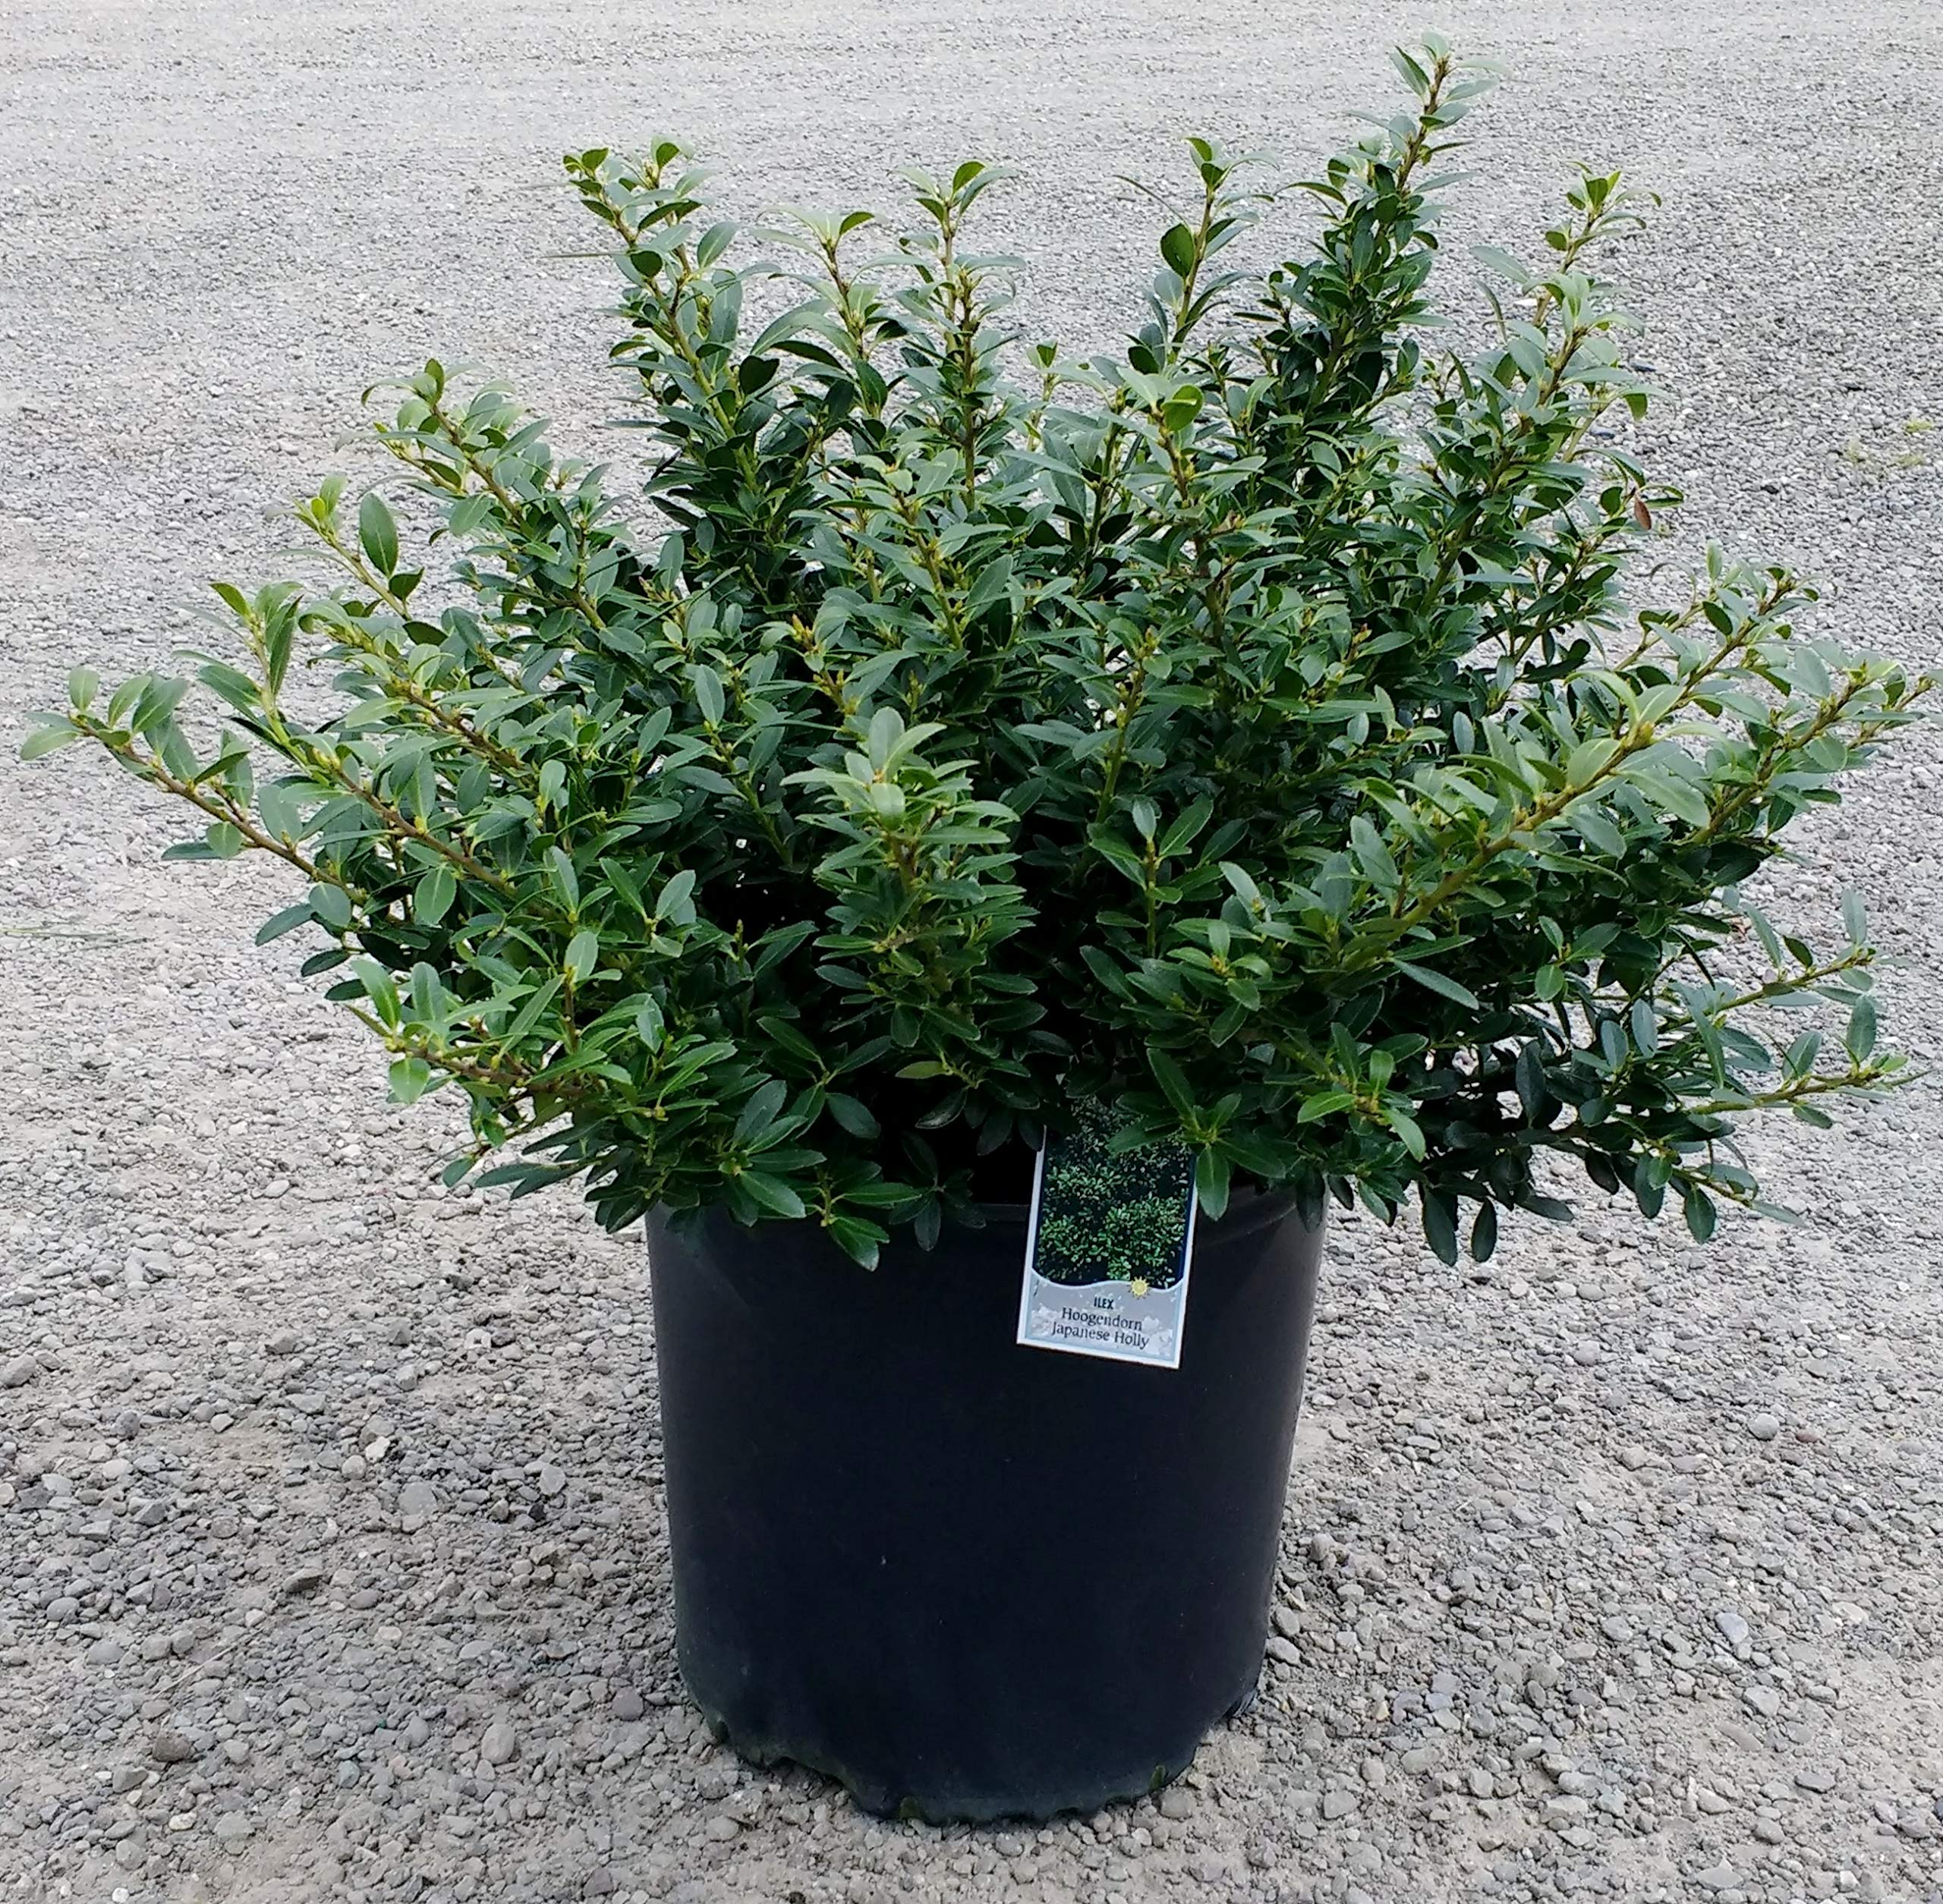 Hoogendorn Japanese Holly - Easy-Care Dwarf Evergreen Shrub - 3 Gallon Pot by Rogers' Nursery